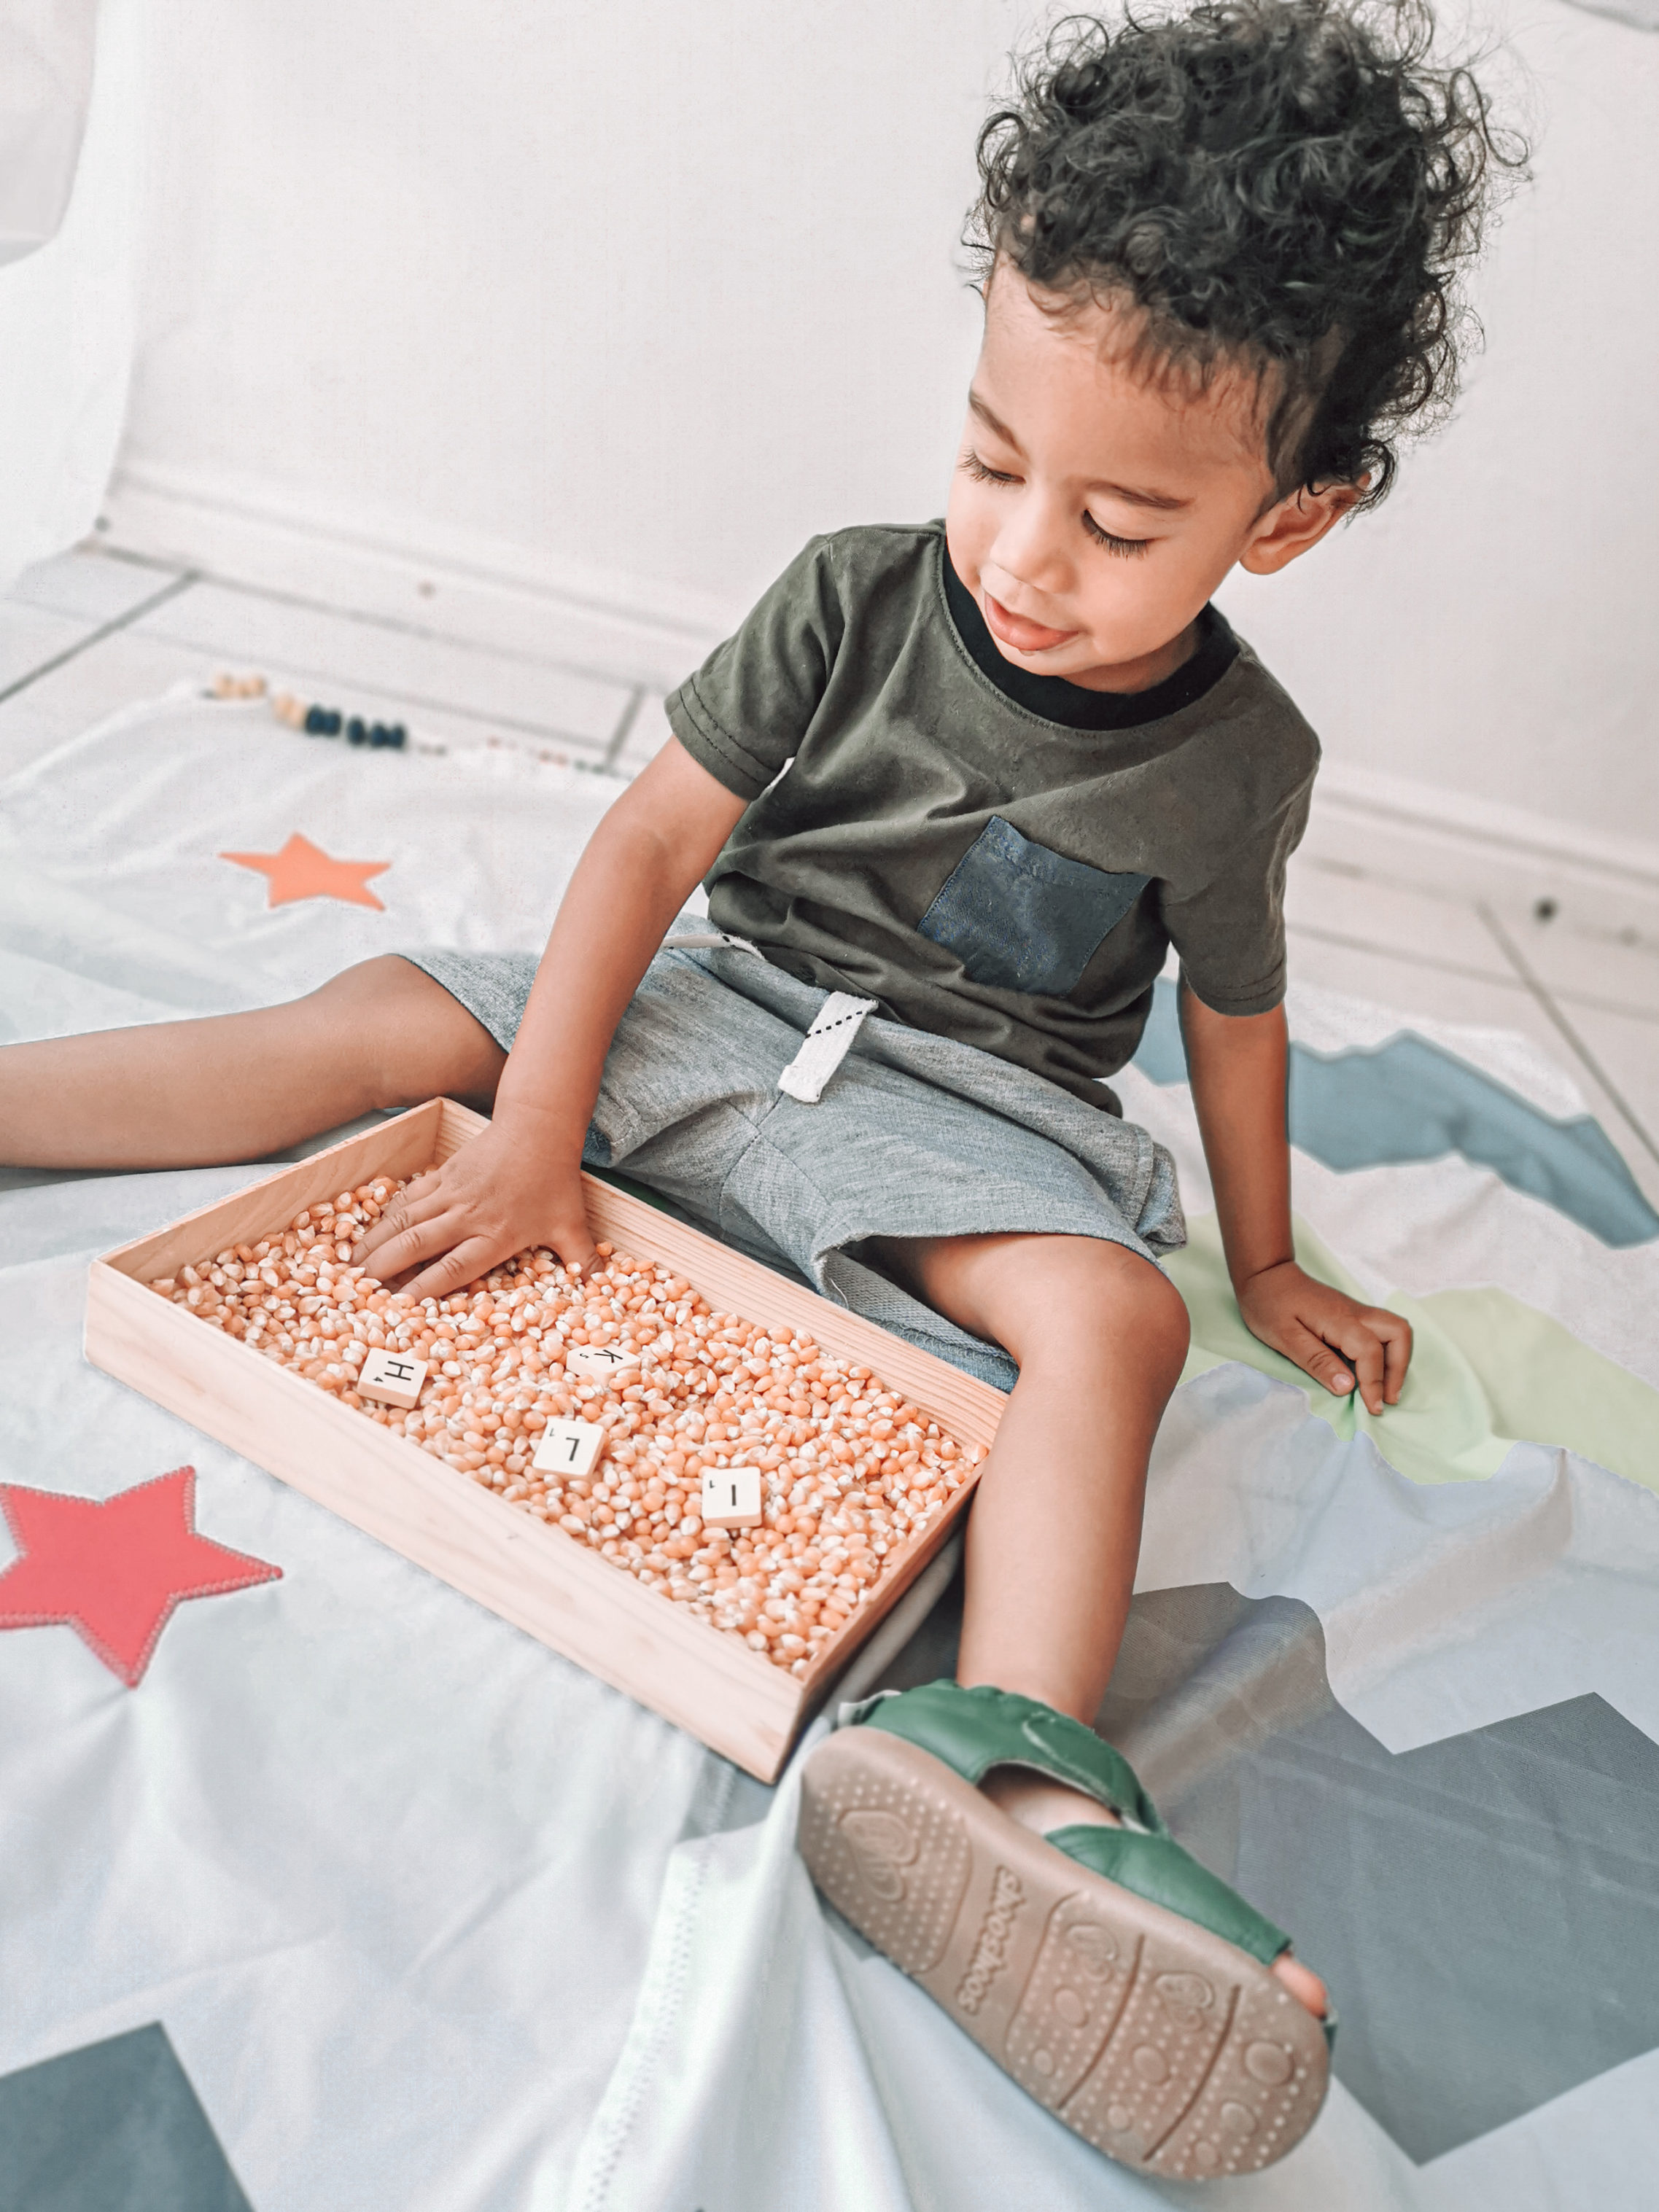 Pop corn sensory box